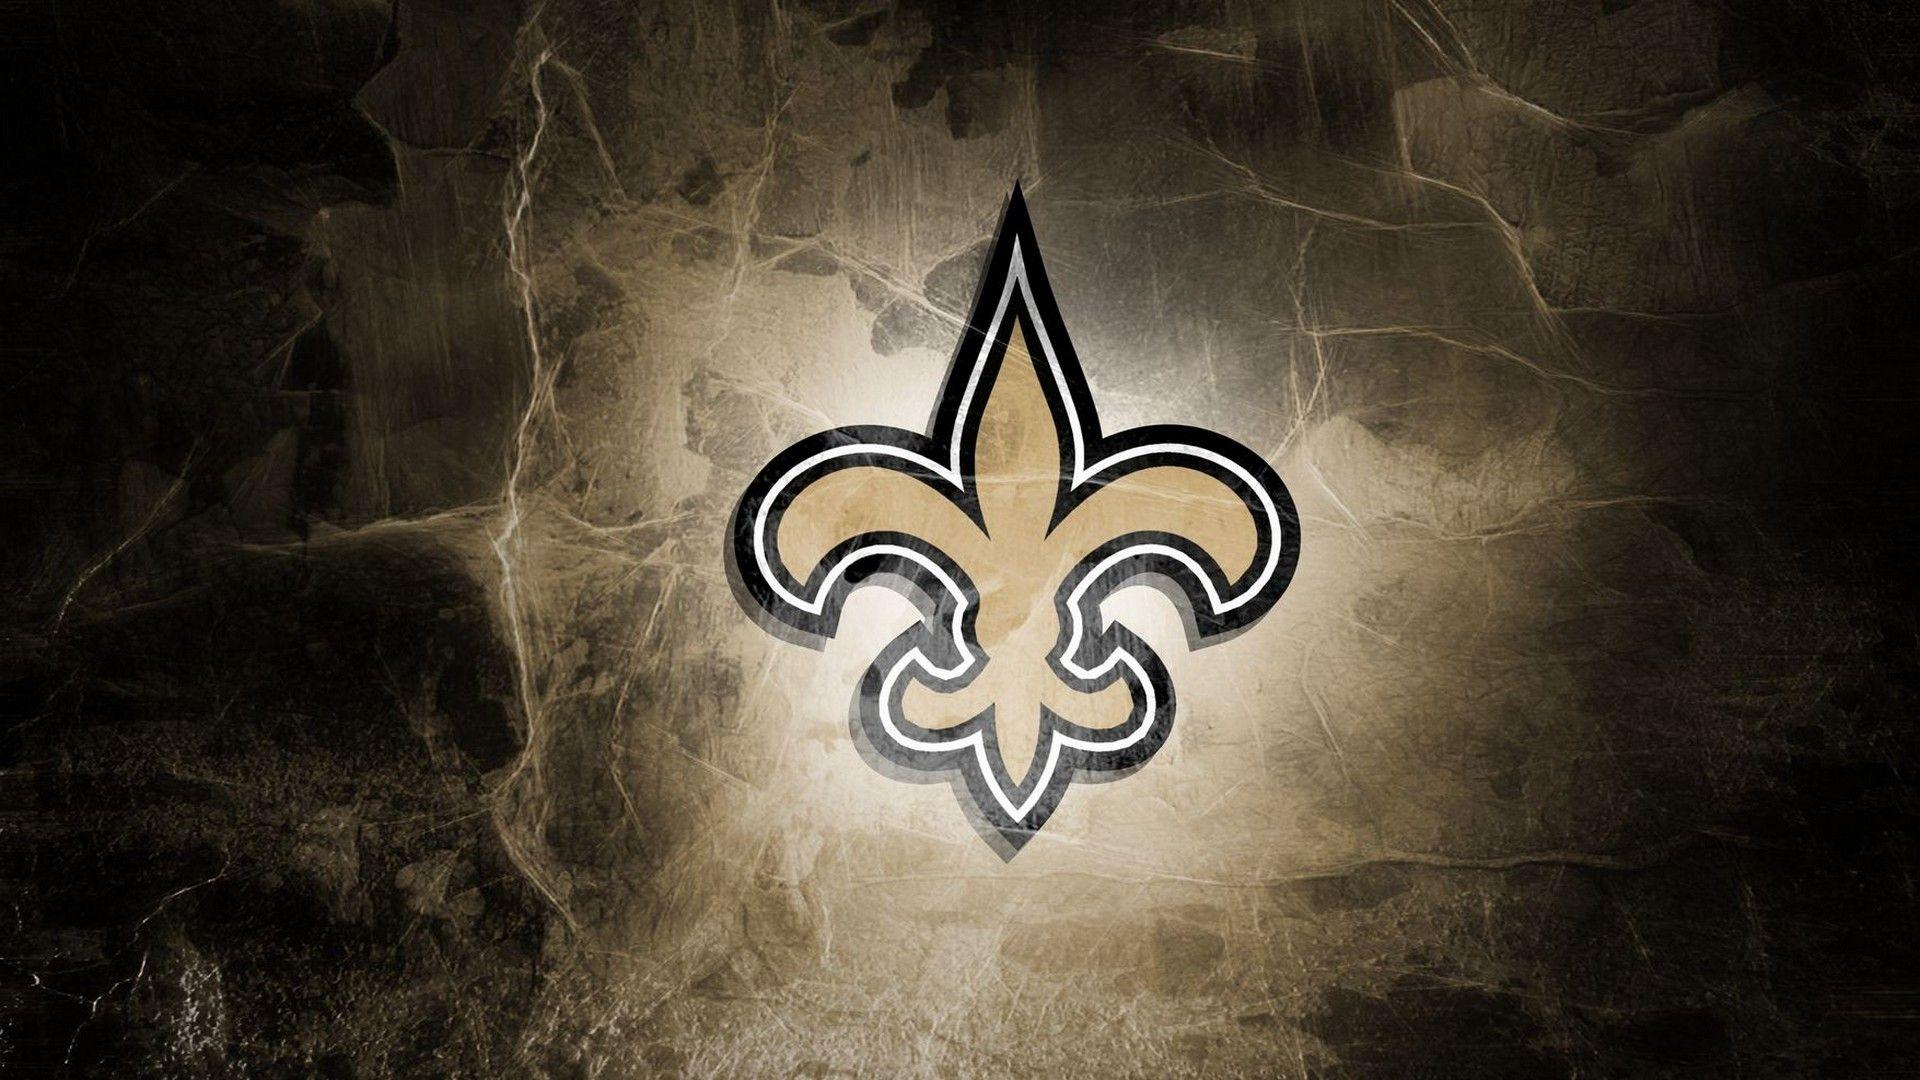 New Orleans Saints NFL For Desktop Wallpaper | New orleans ...